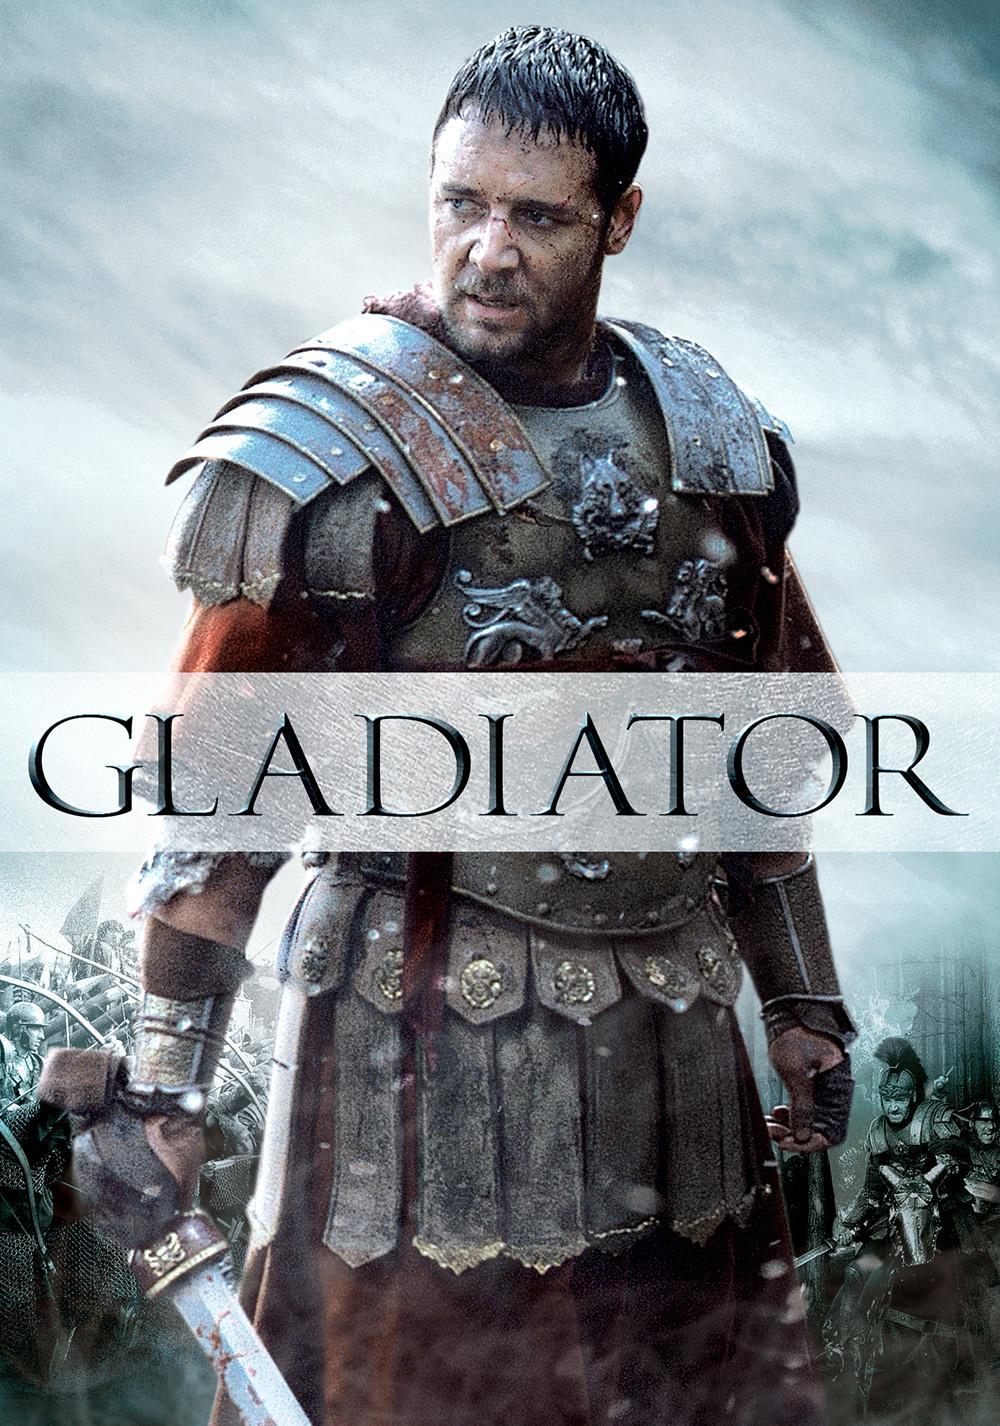 gladiator 2 دانلود فیلم Gladiator 2000 : کیفیت ۴K UHD BluRay REMUX HDR با حجم ۲۸ گیگابایت اضافه شد